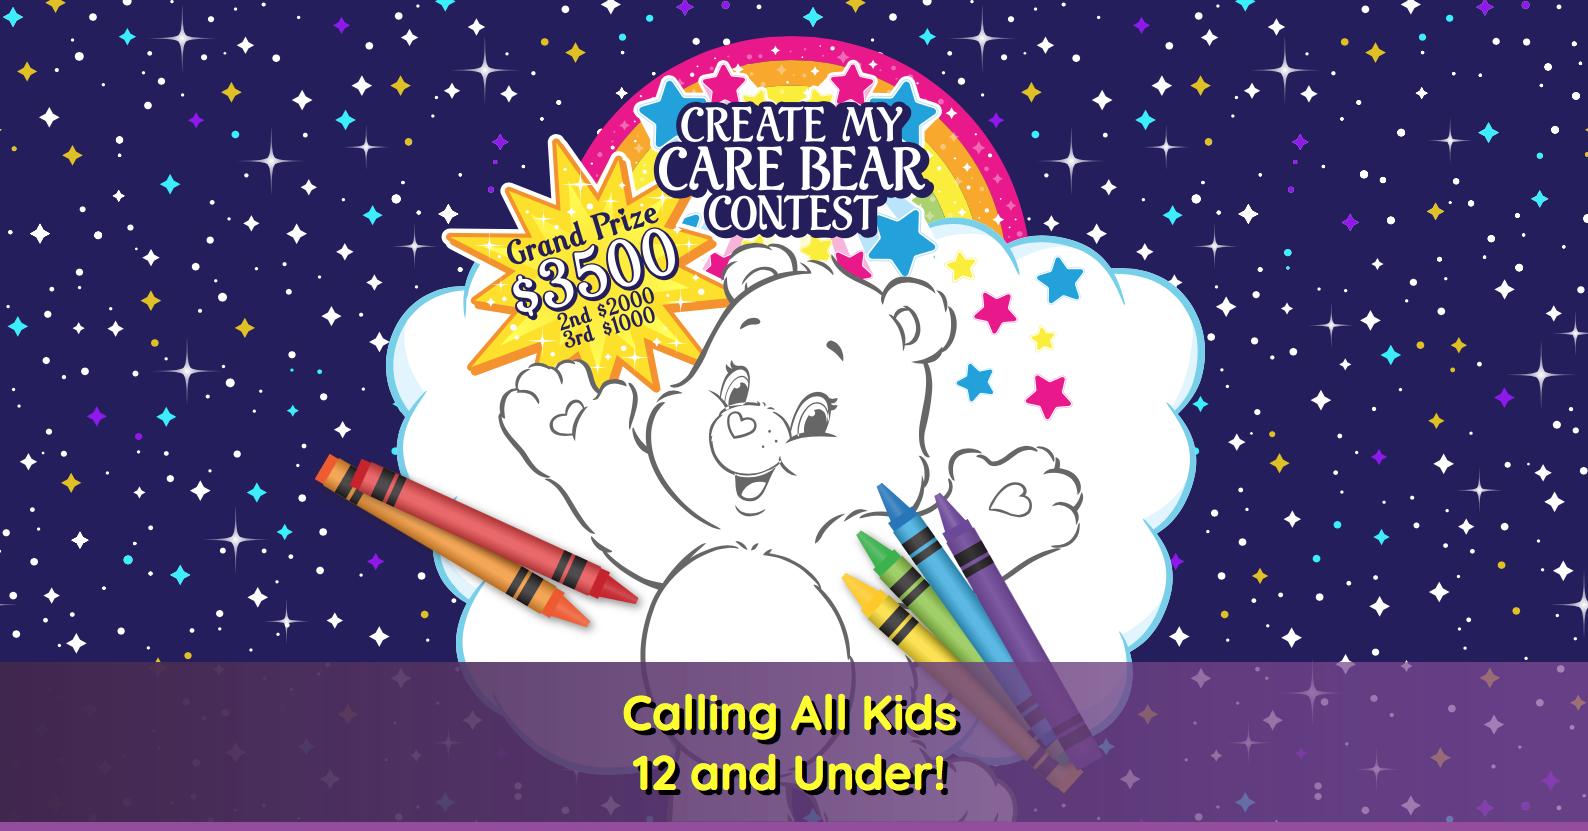 CREATE MY CARE BEAR CONTEST -